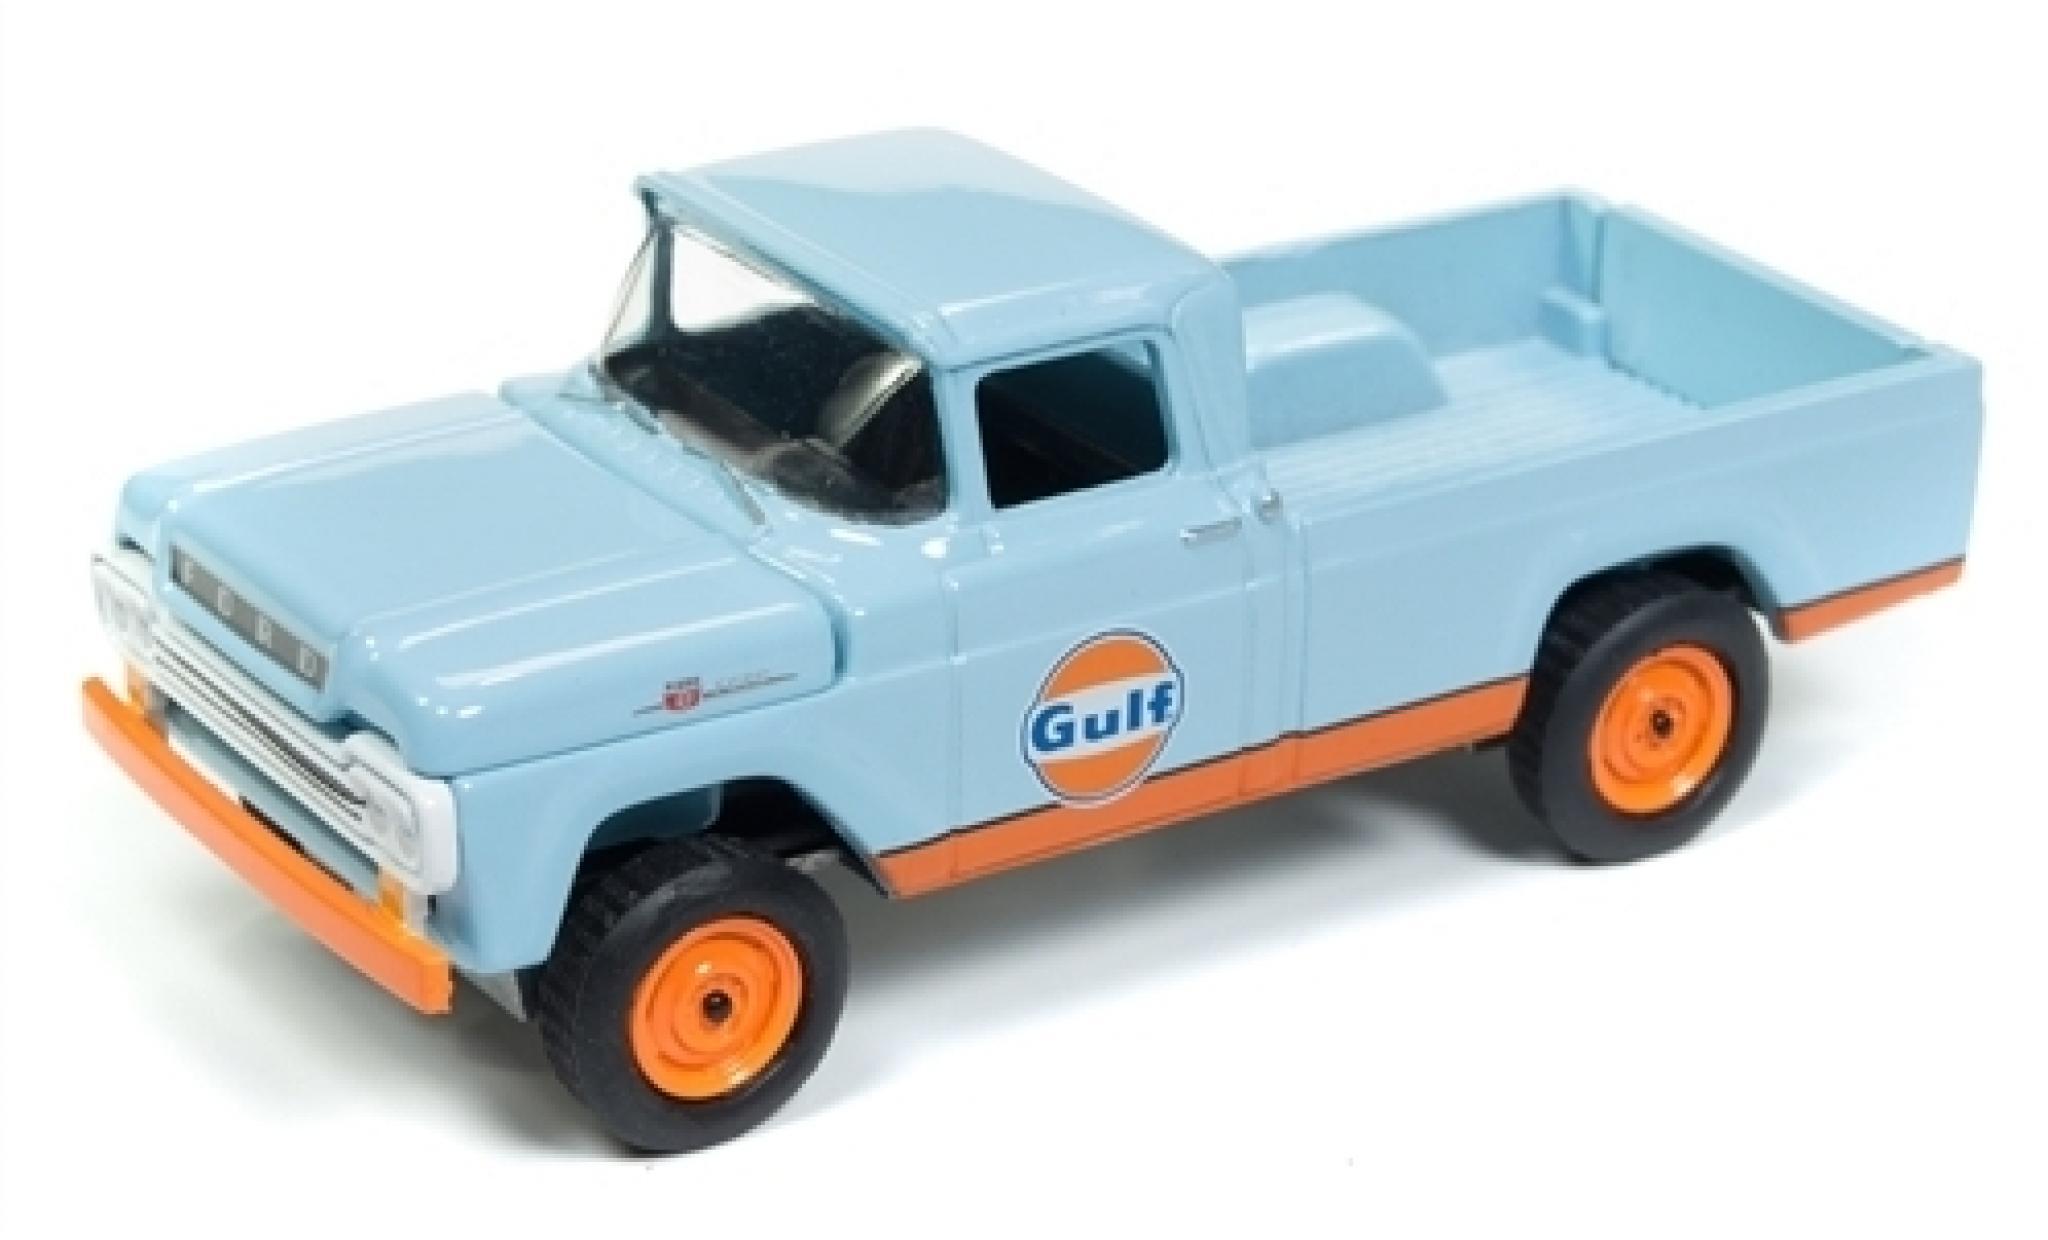 Ford F-250 1/64 Racing Champions Mint Gulf 1959